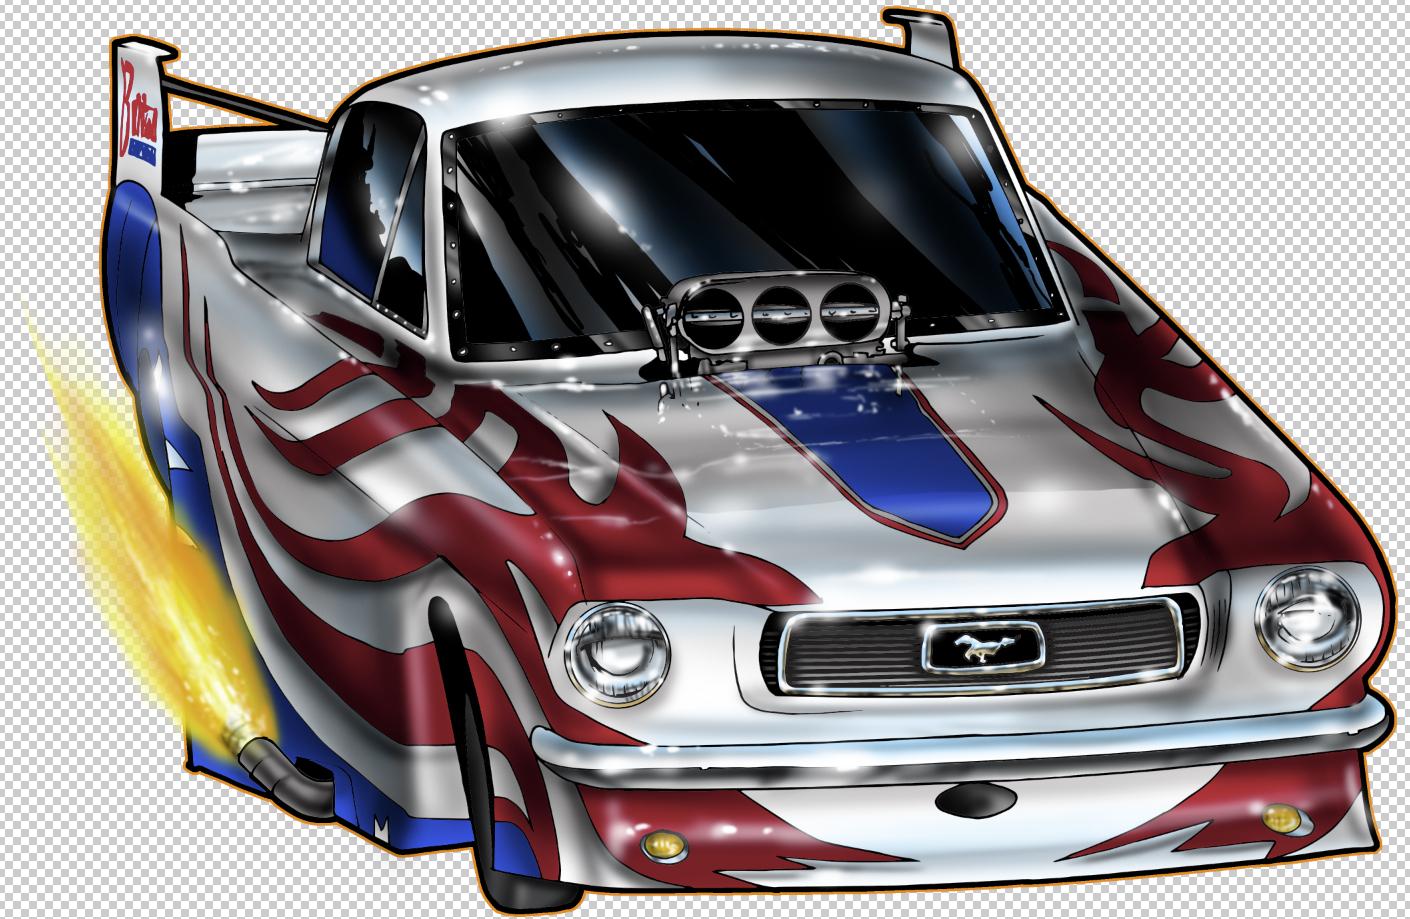 Horan Mustang.psd _ 33.3% (Layer 1 copy, RGB_8) 2017-06-15 23-37-54